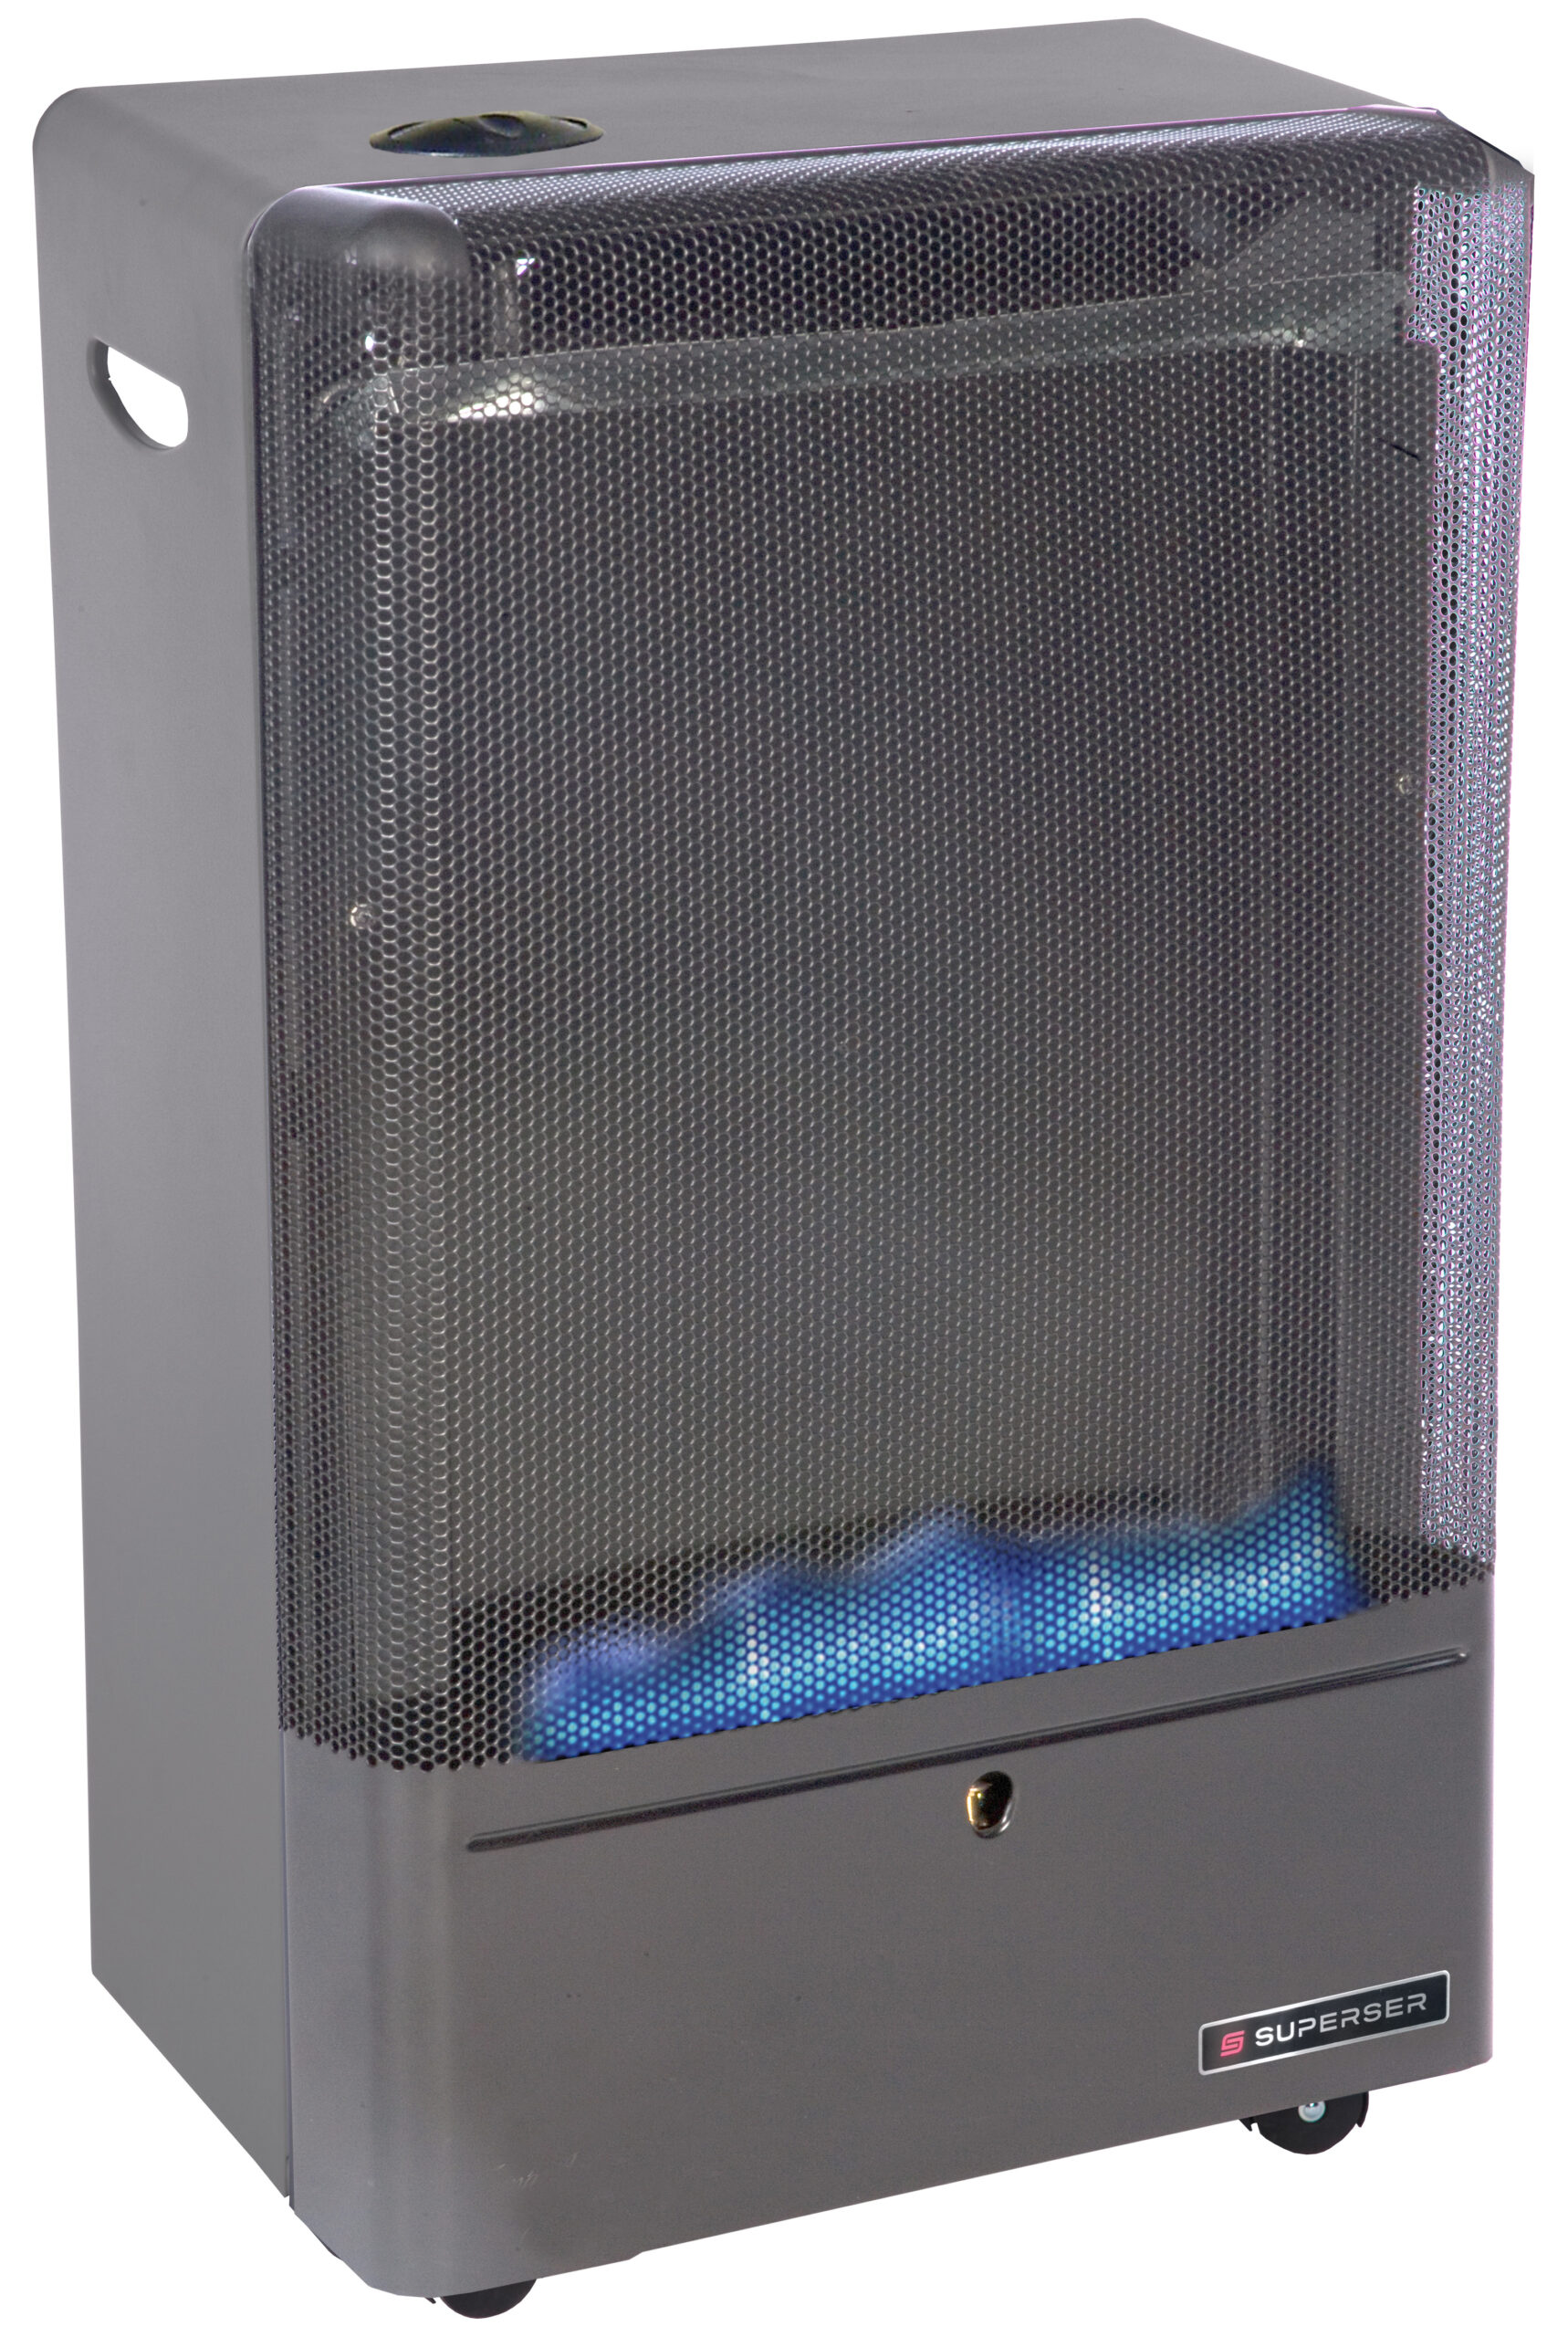 HBF15 Blue Flame